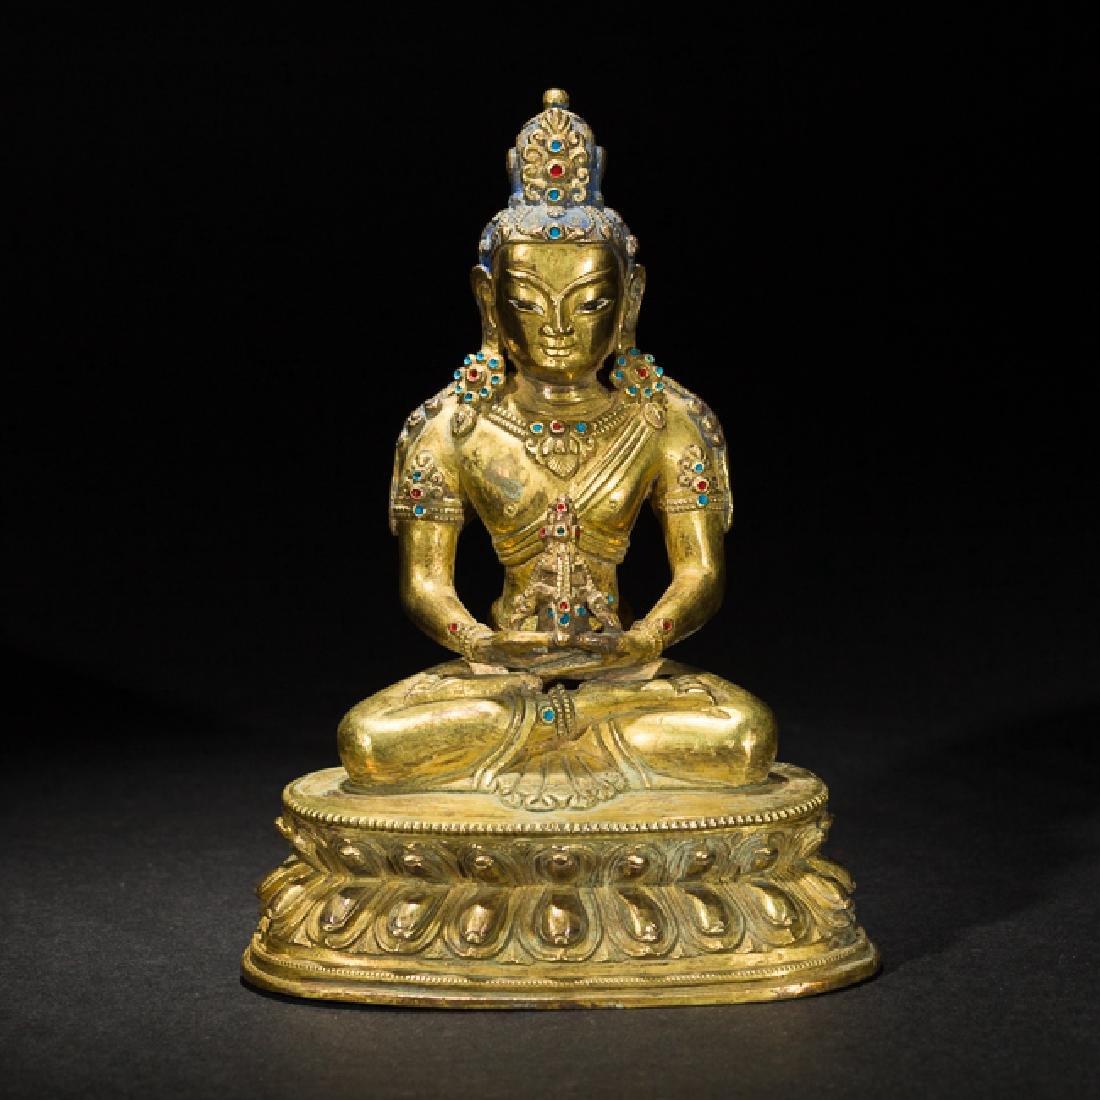 Antique Gilt Bronze Figure of Bodhisattva Buddha, 19th